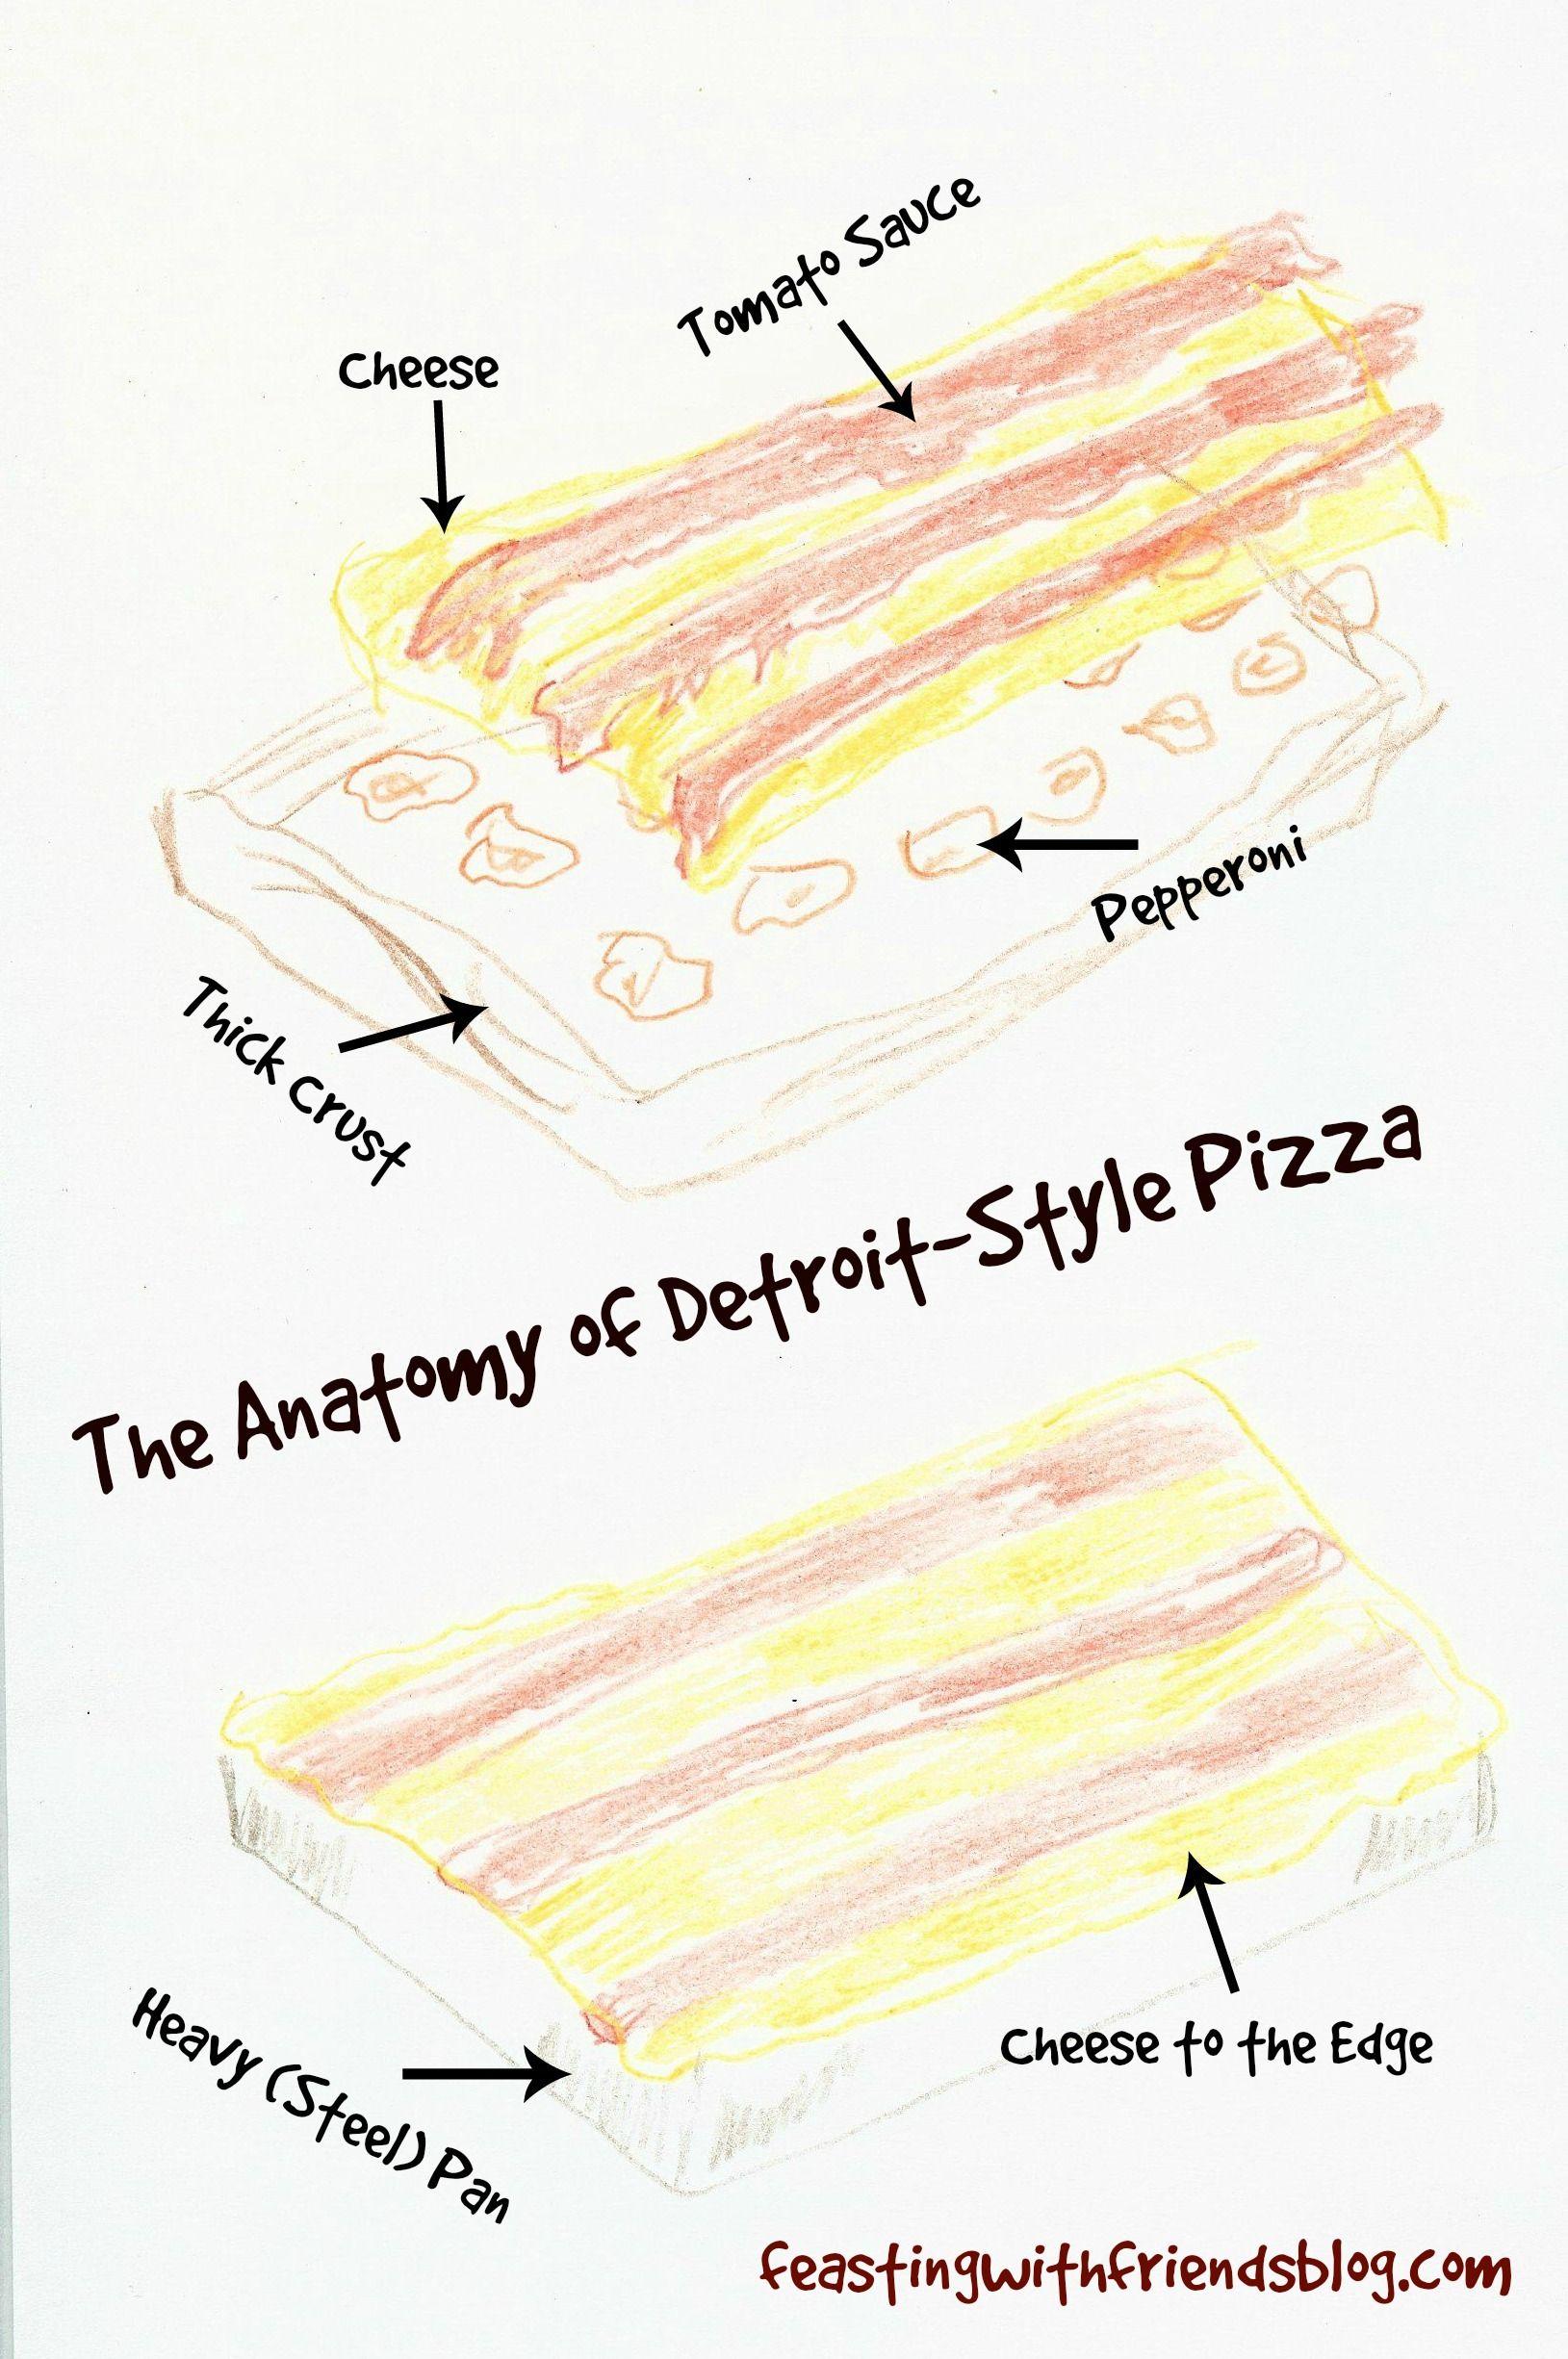 the anatomy of detroit style pizza | Mmmyumm | Pinterest